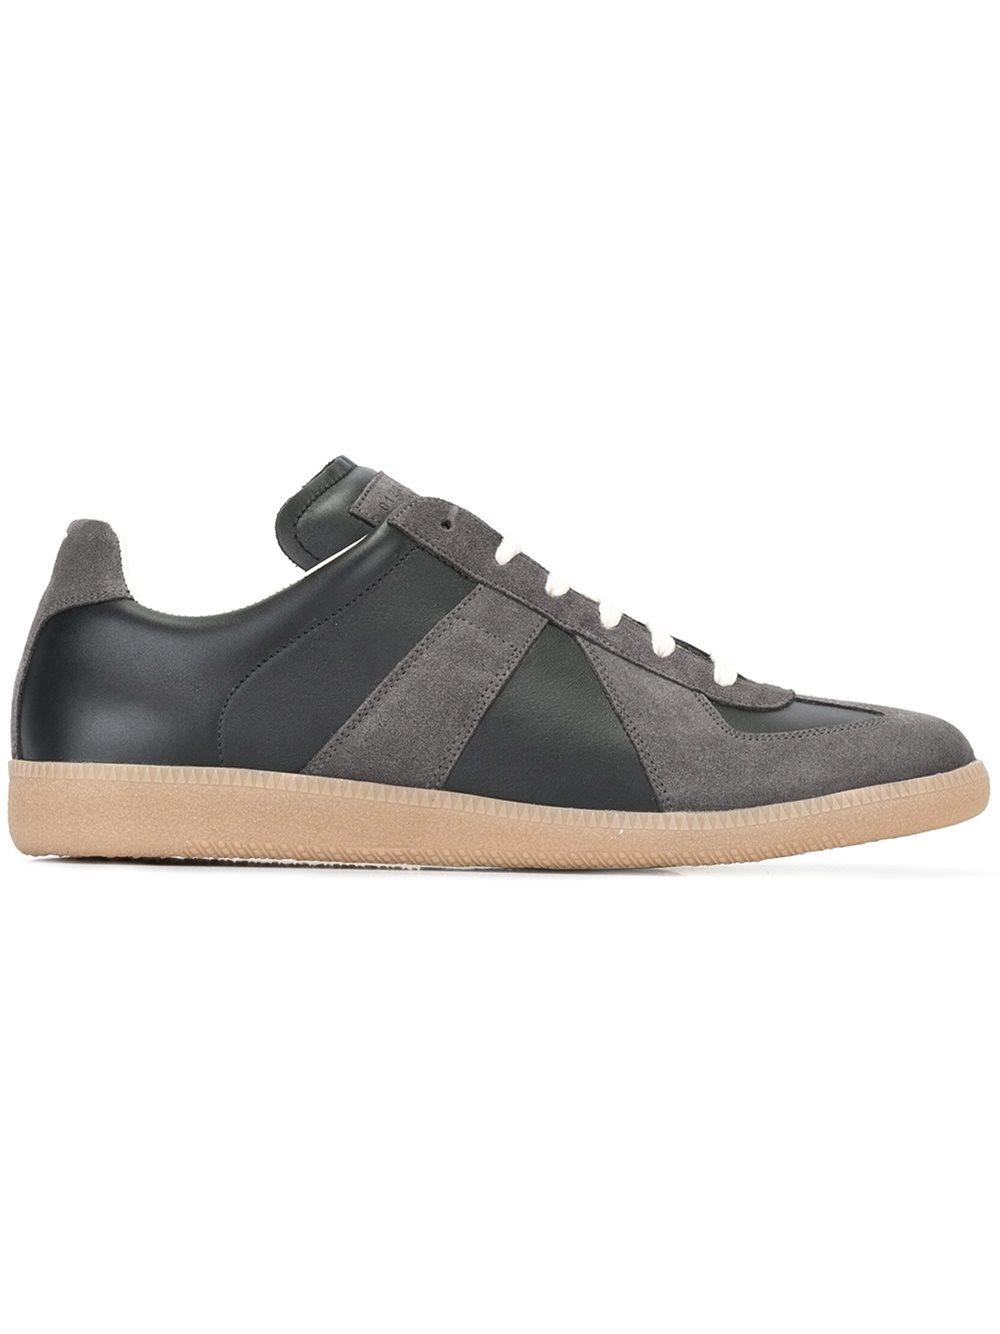 Maison Margiela Replica Sneakers In Brown For Men Lyst